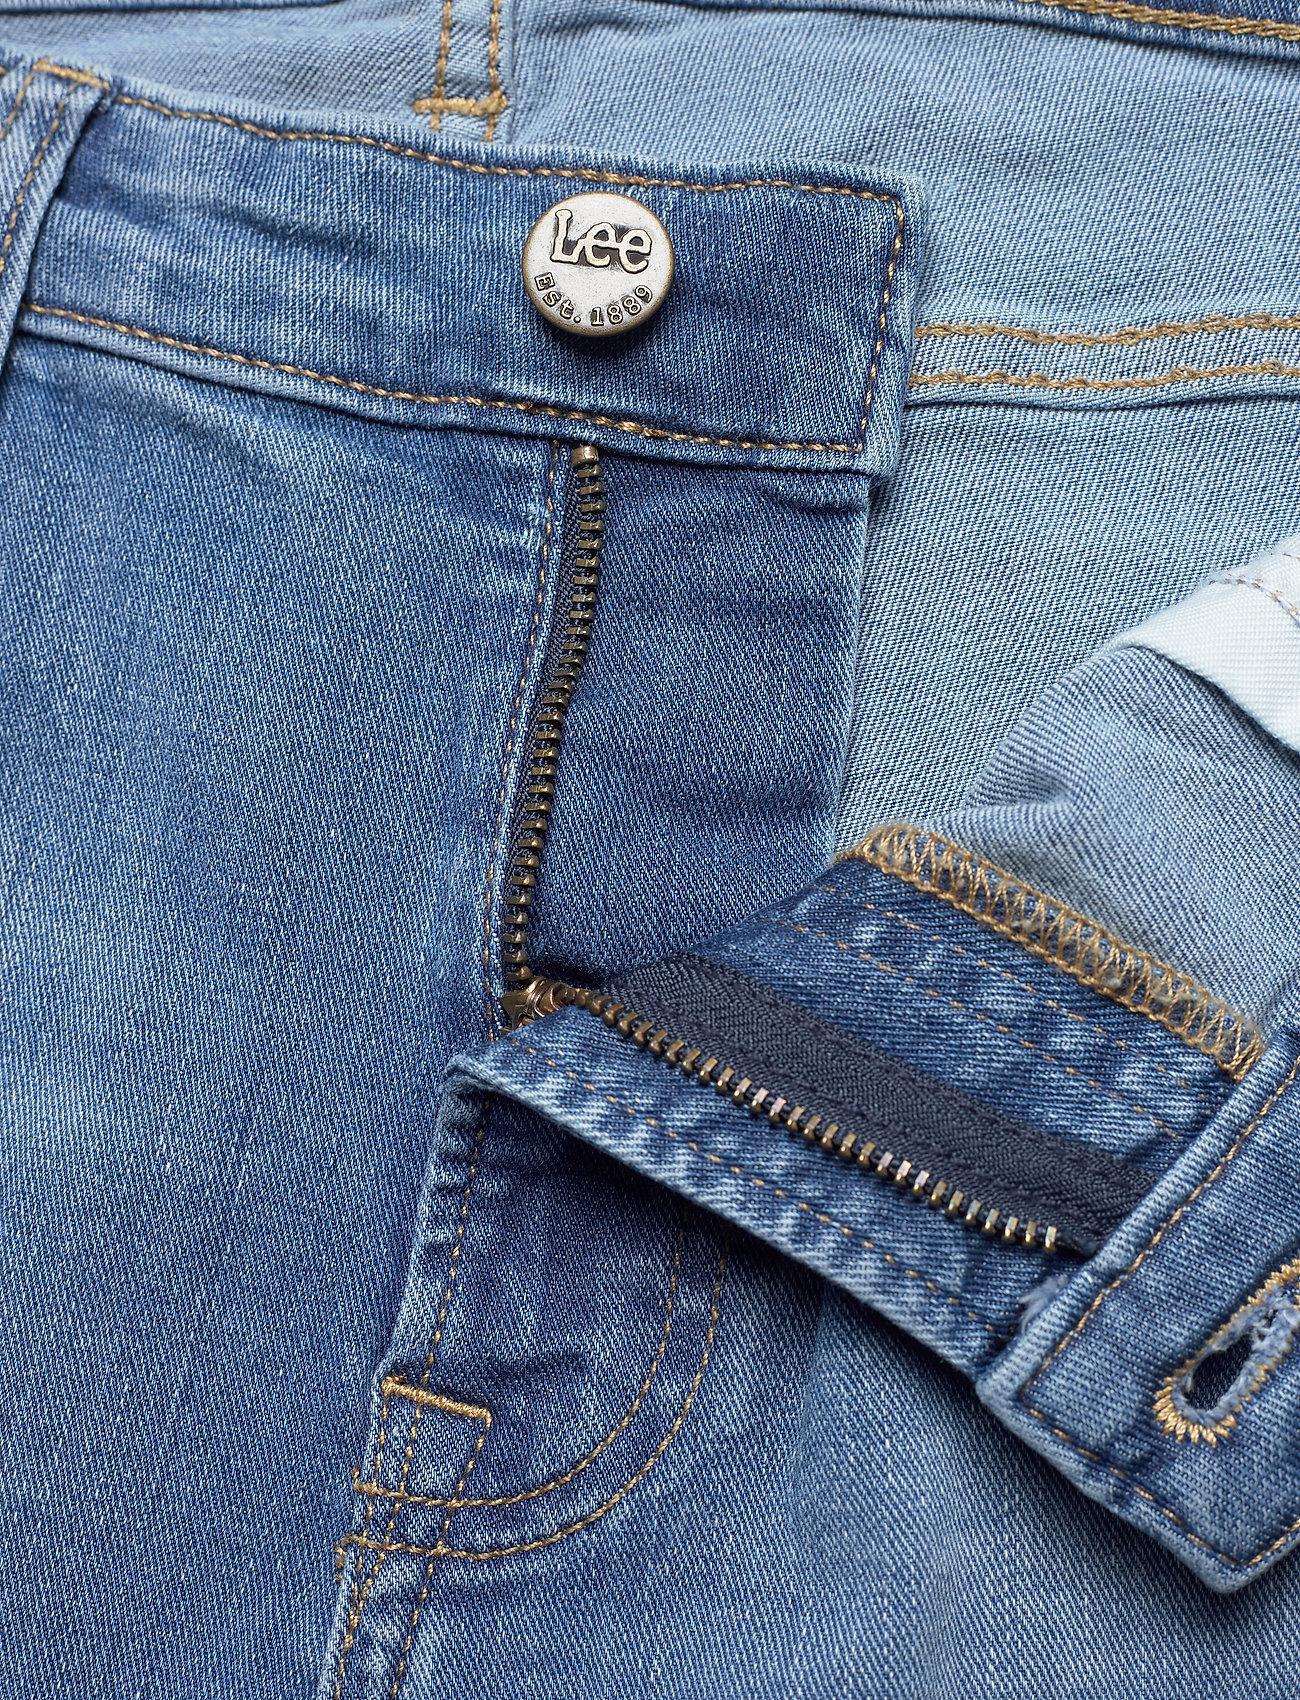 Lee Jeans Malone - Jeans MID WORN UNION - Menn Klær